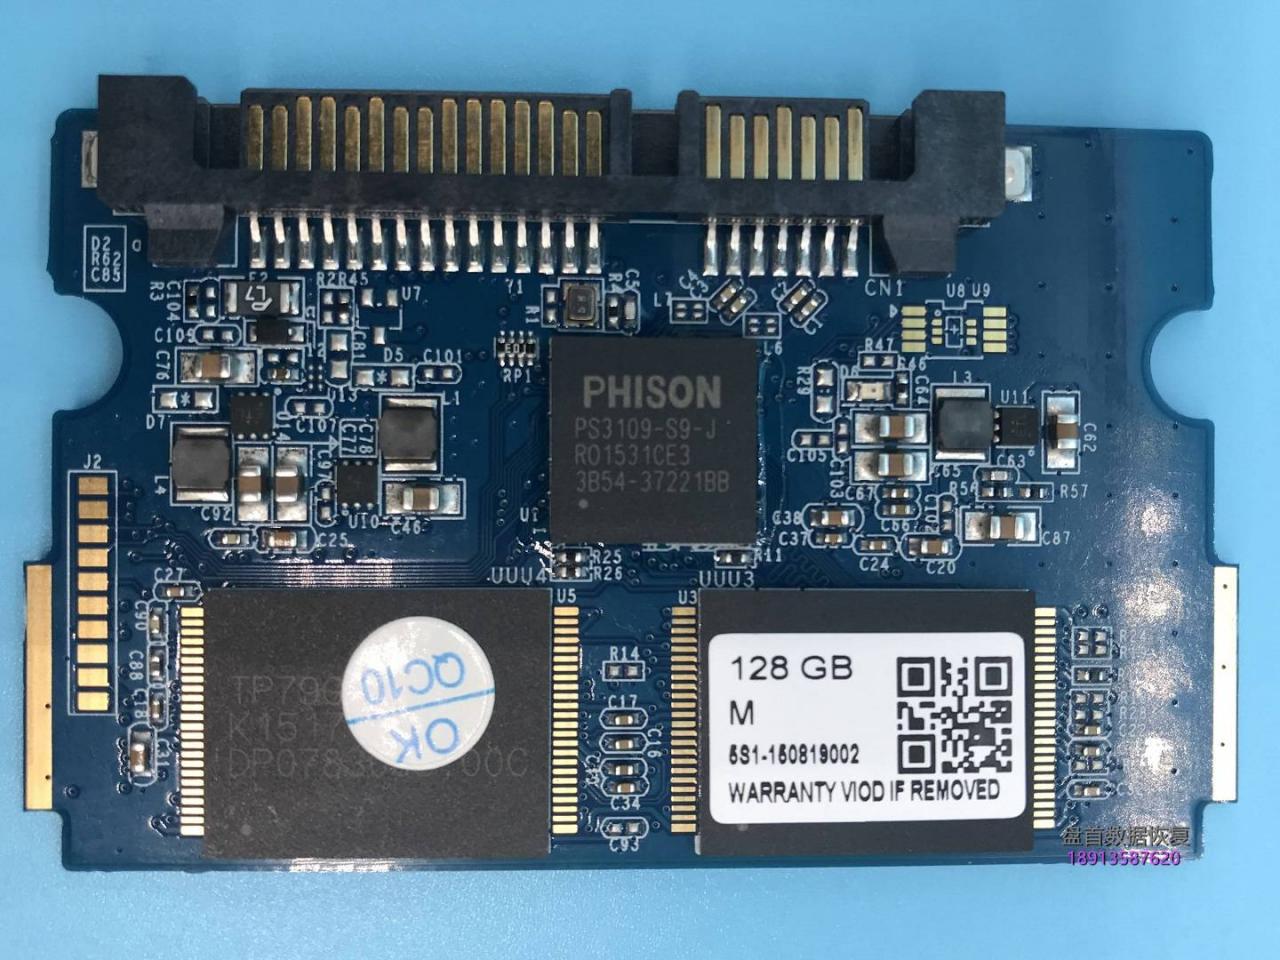 SSD固态硬盘掉盘无法识别主控型号PS3109S9掉固件无法读盘数据恢复